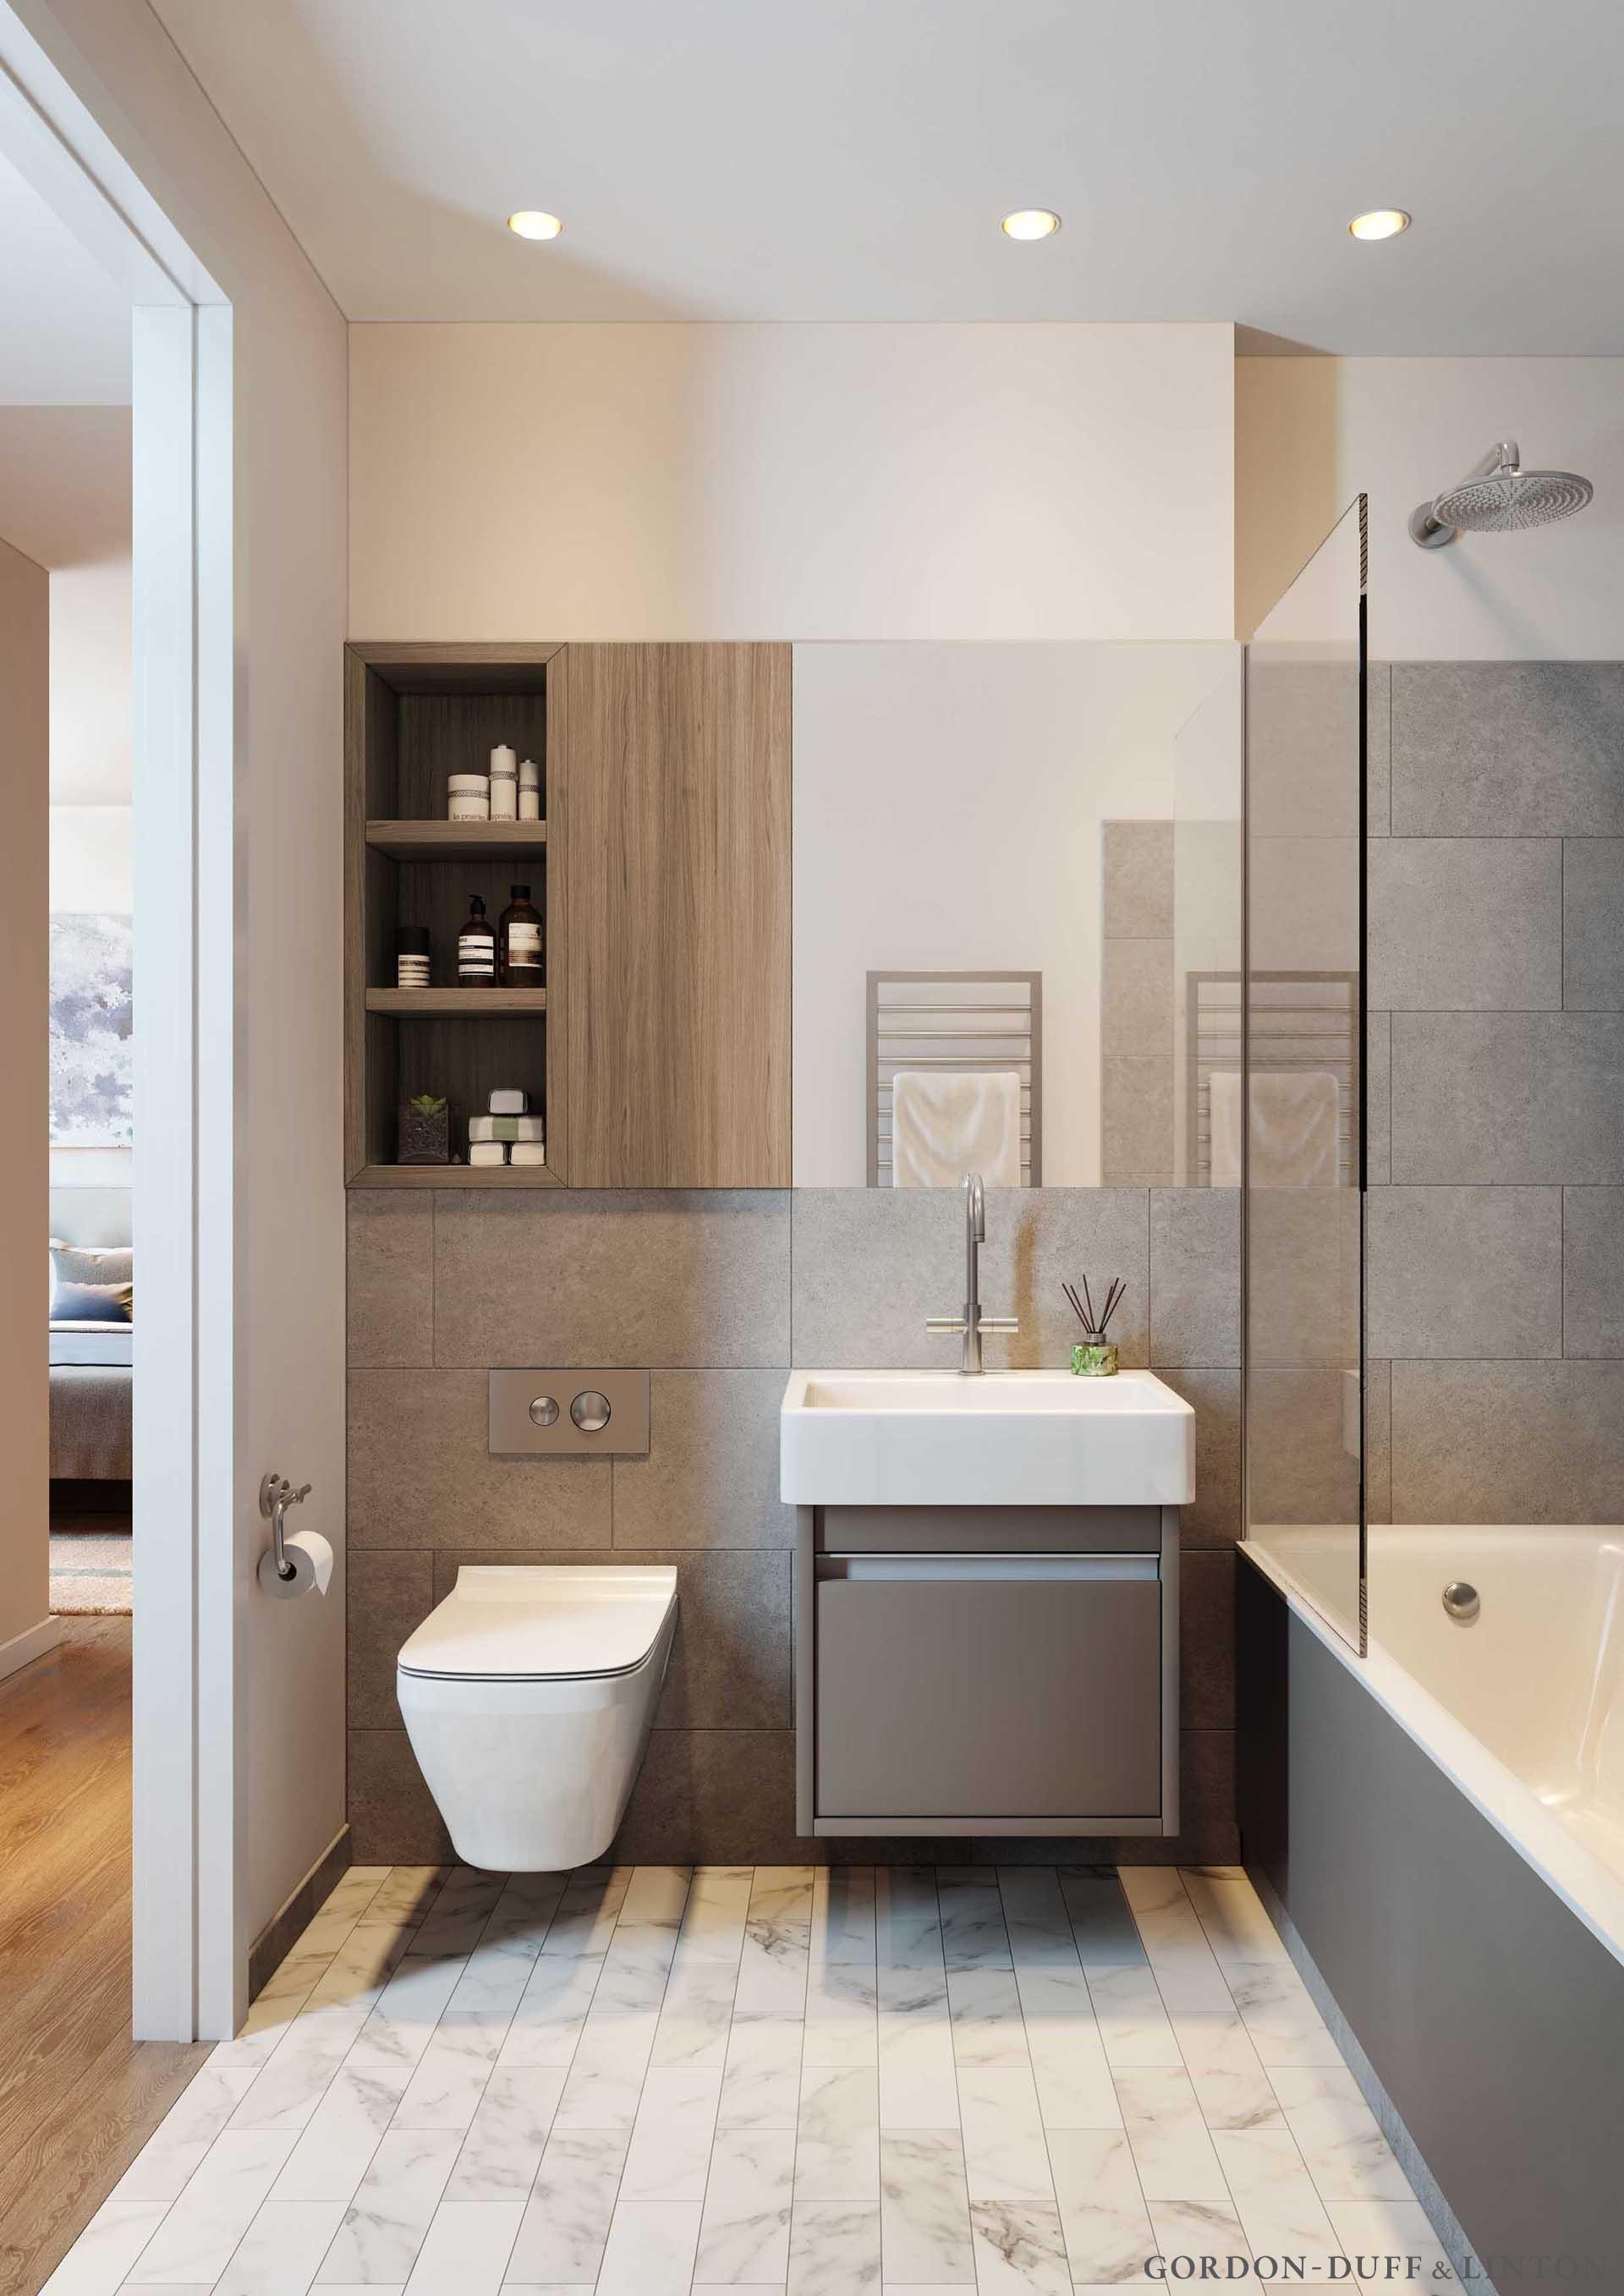 Meuble Salle De Bain Huy ~ the maple building gordon duff linton cgi of bathroom house